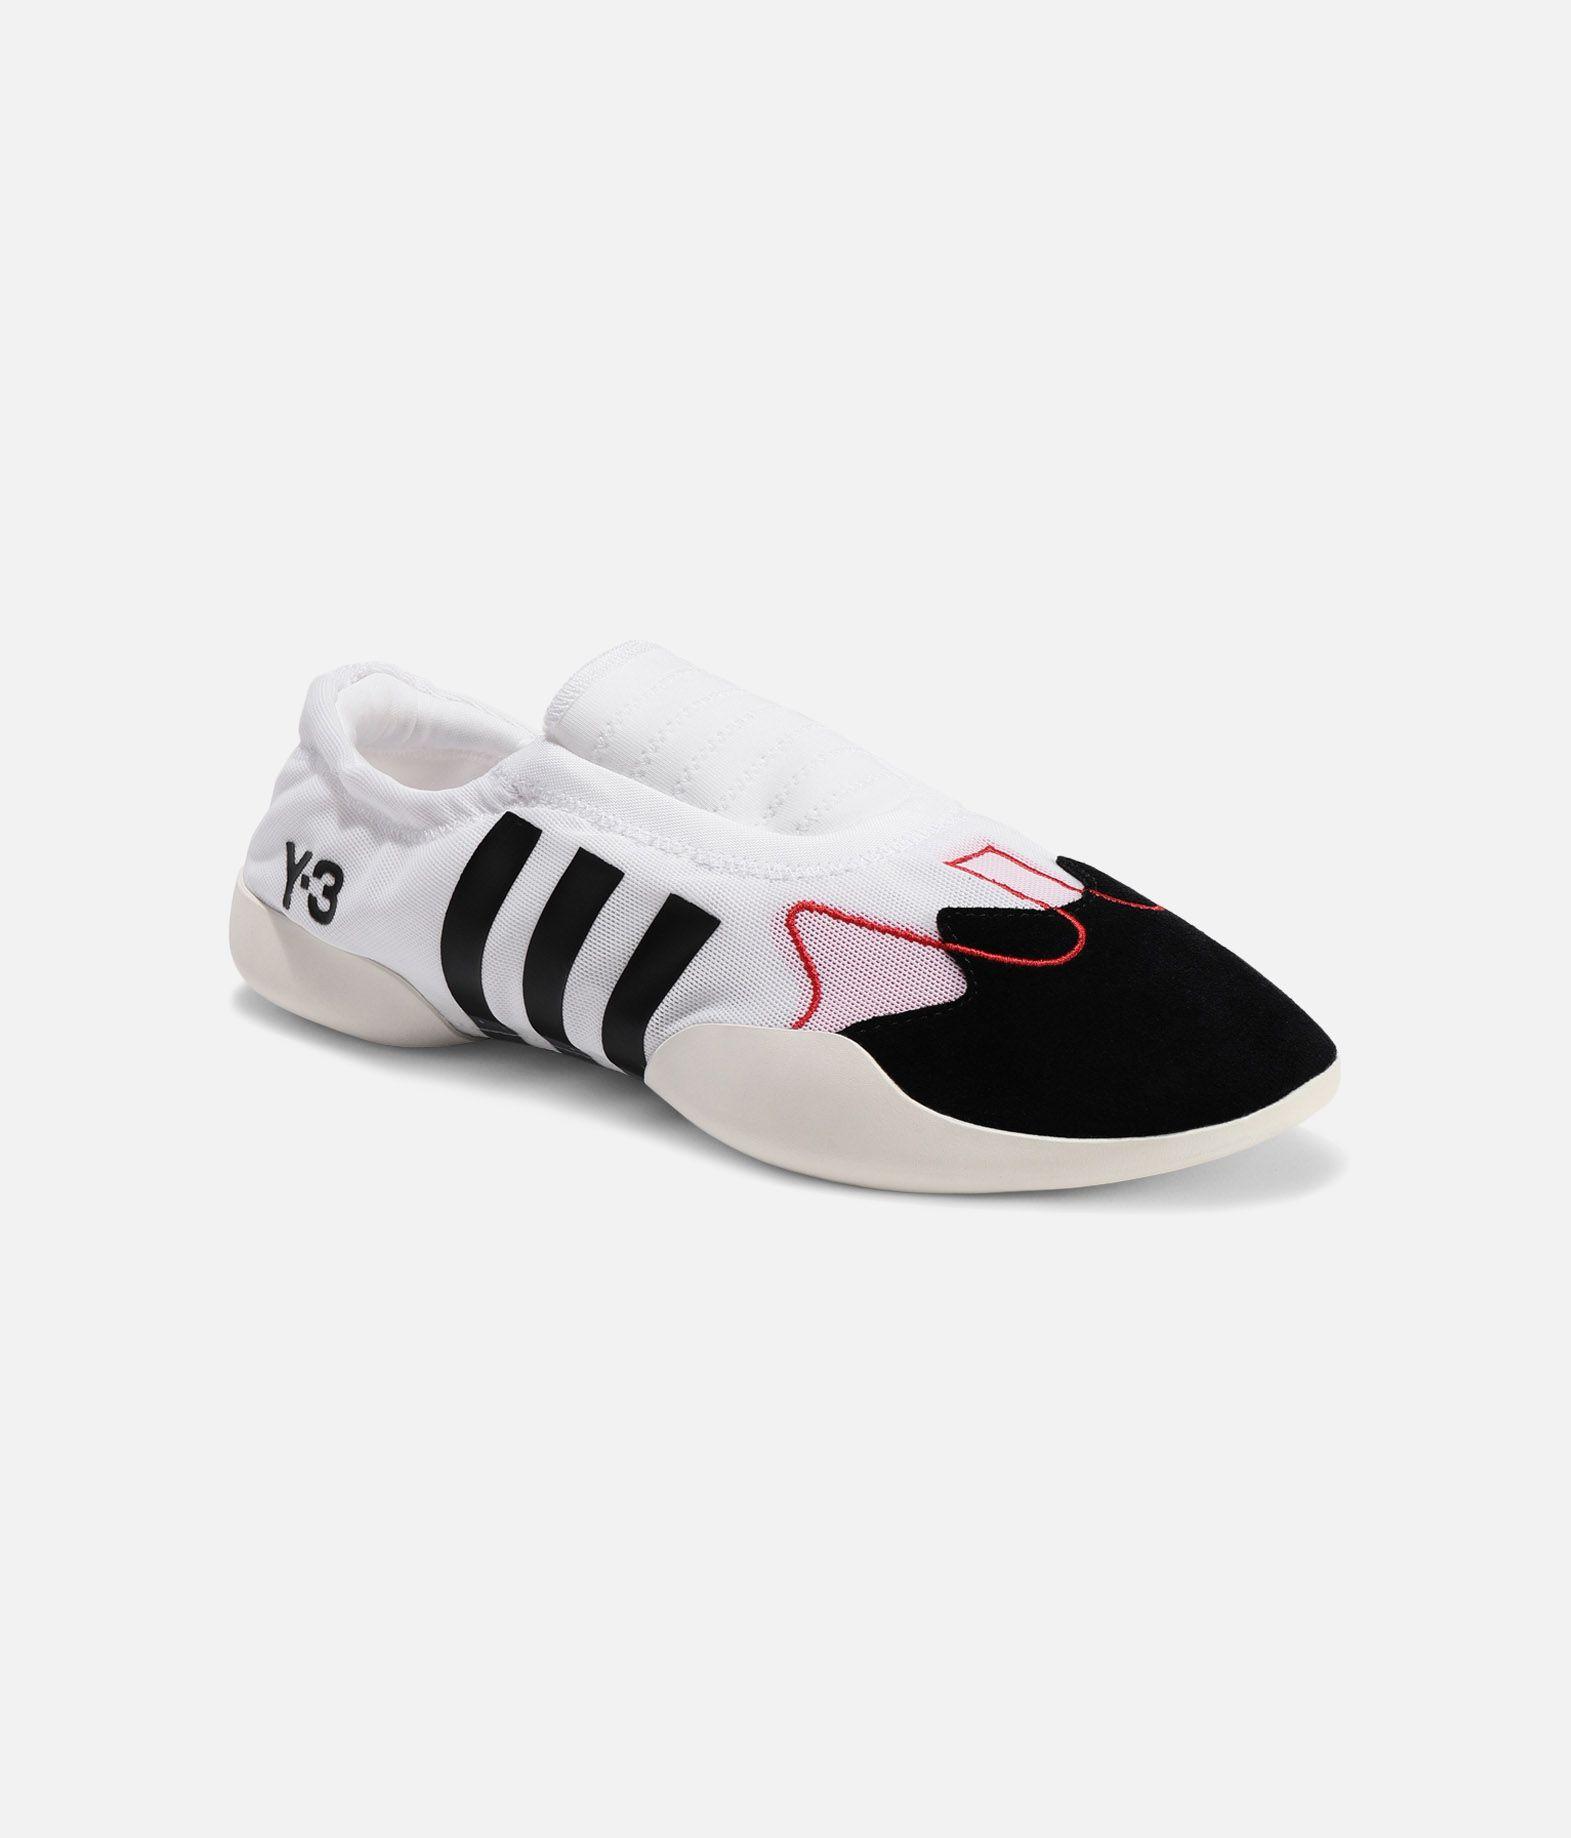 Y-3 Y-3 Taekwondo Sneakers Woman e